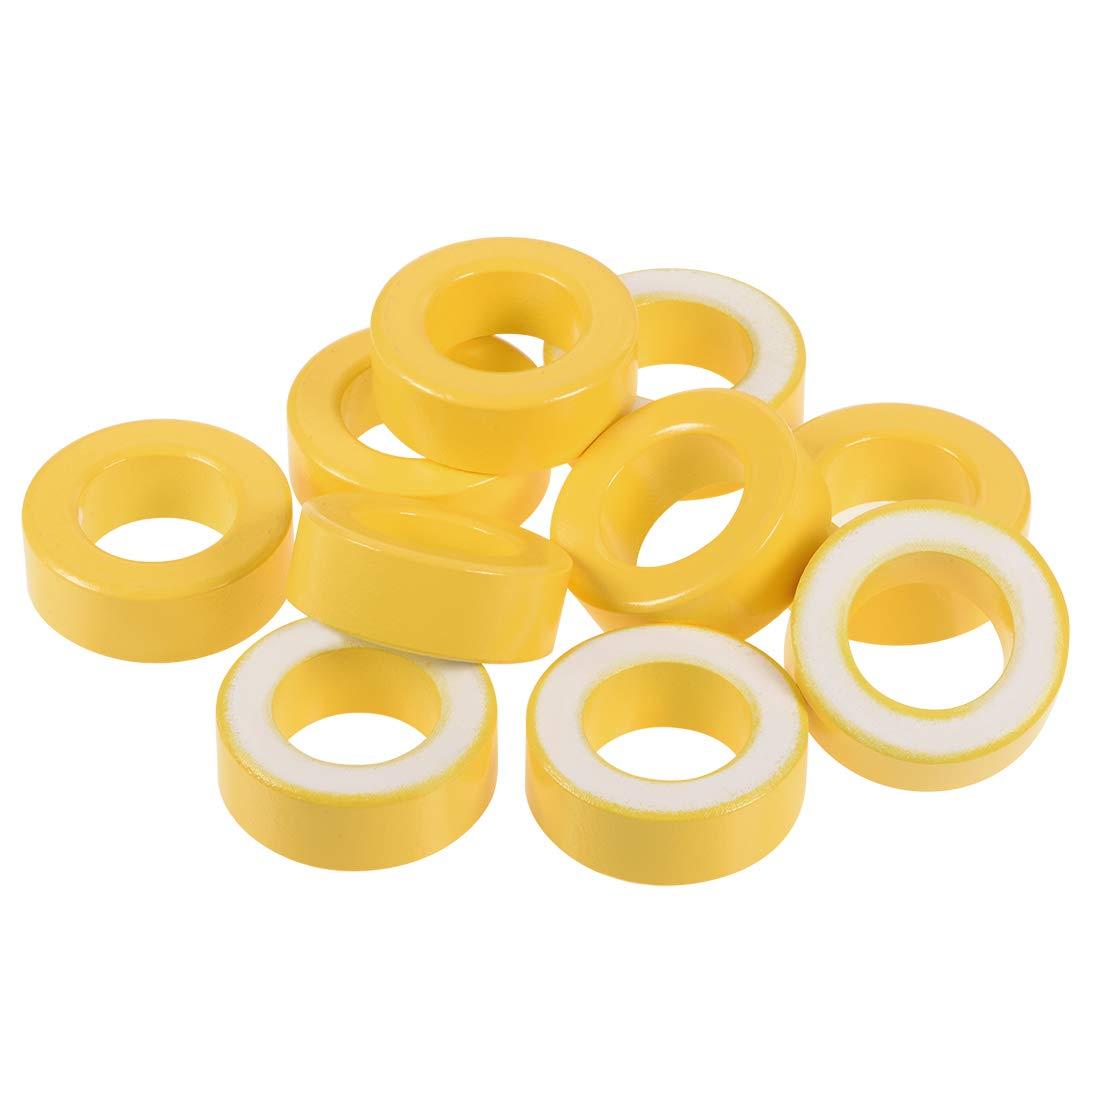 uxcell 10pcs 24 x 40.3 x 15mm Ferrite Ring Iron Powder Toroid Cores Yellow White